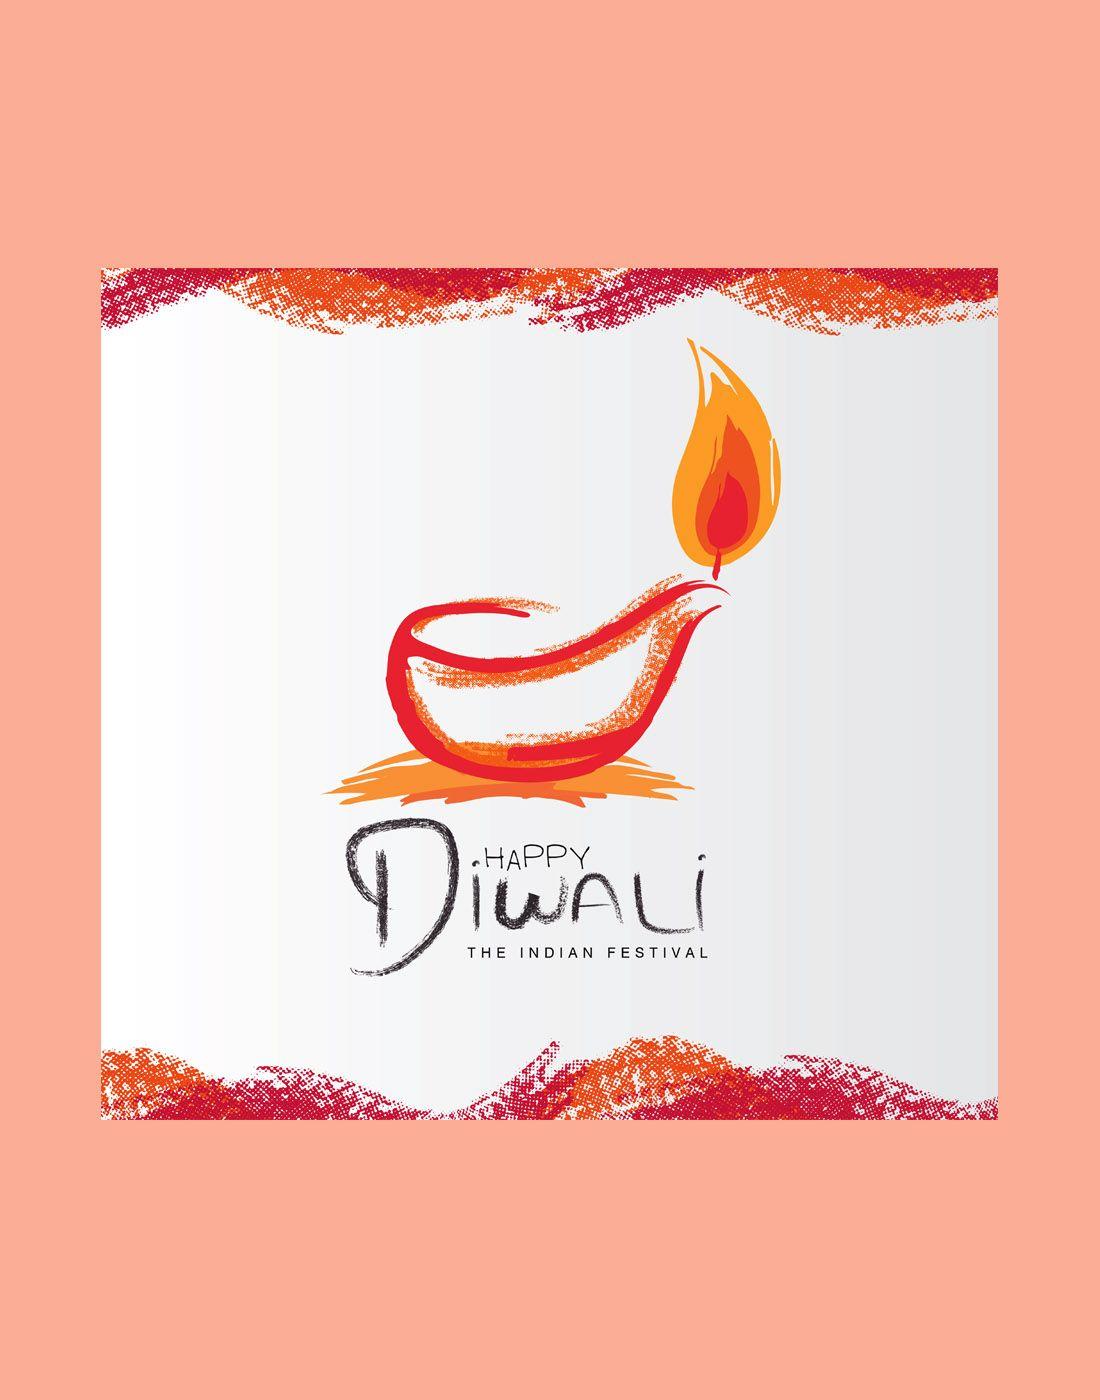 Modern Diwali Vector Download In